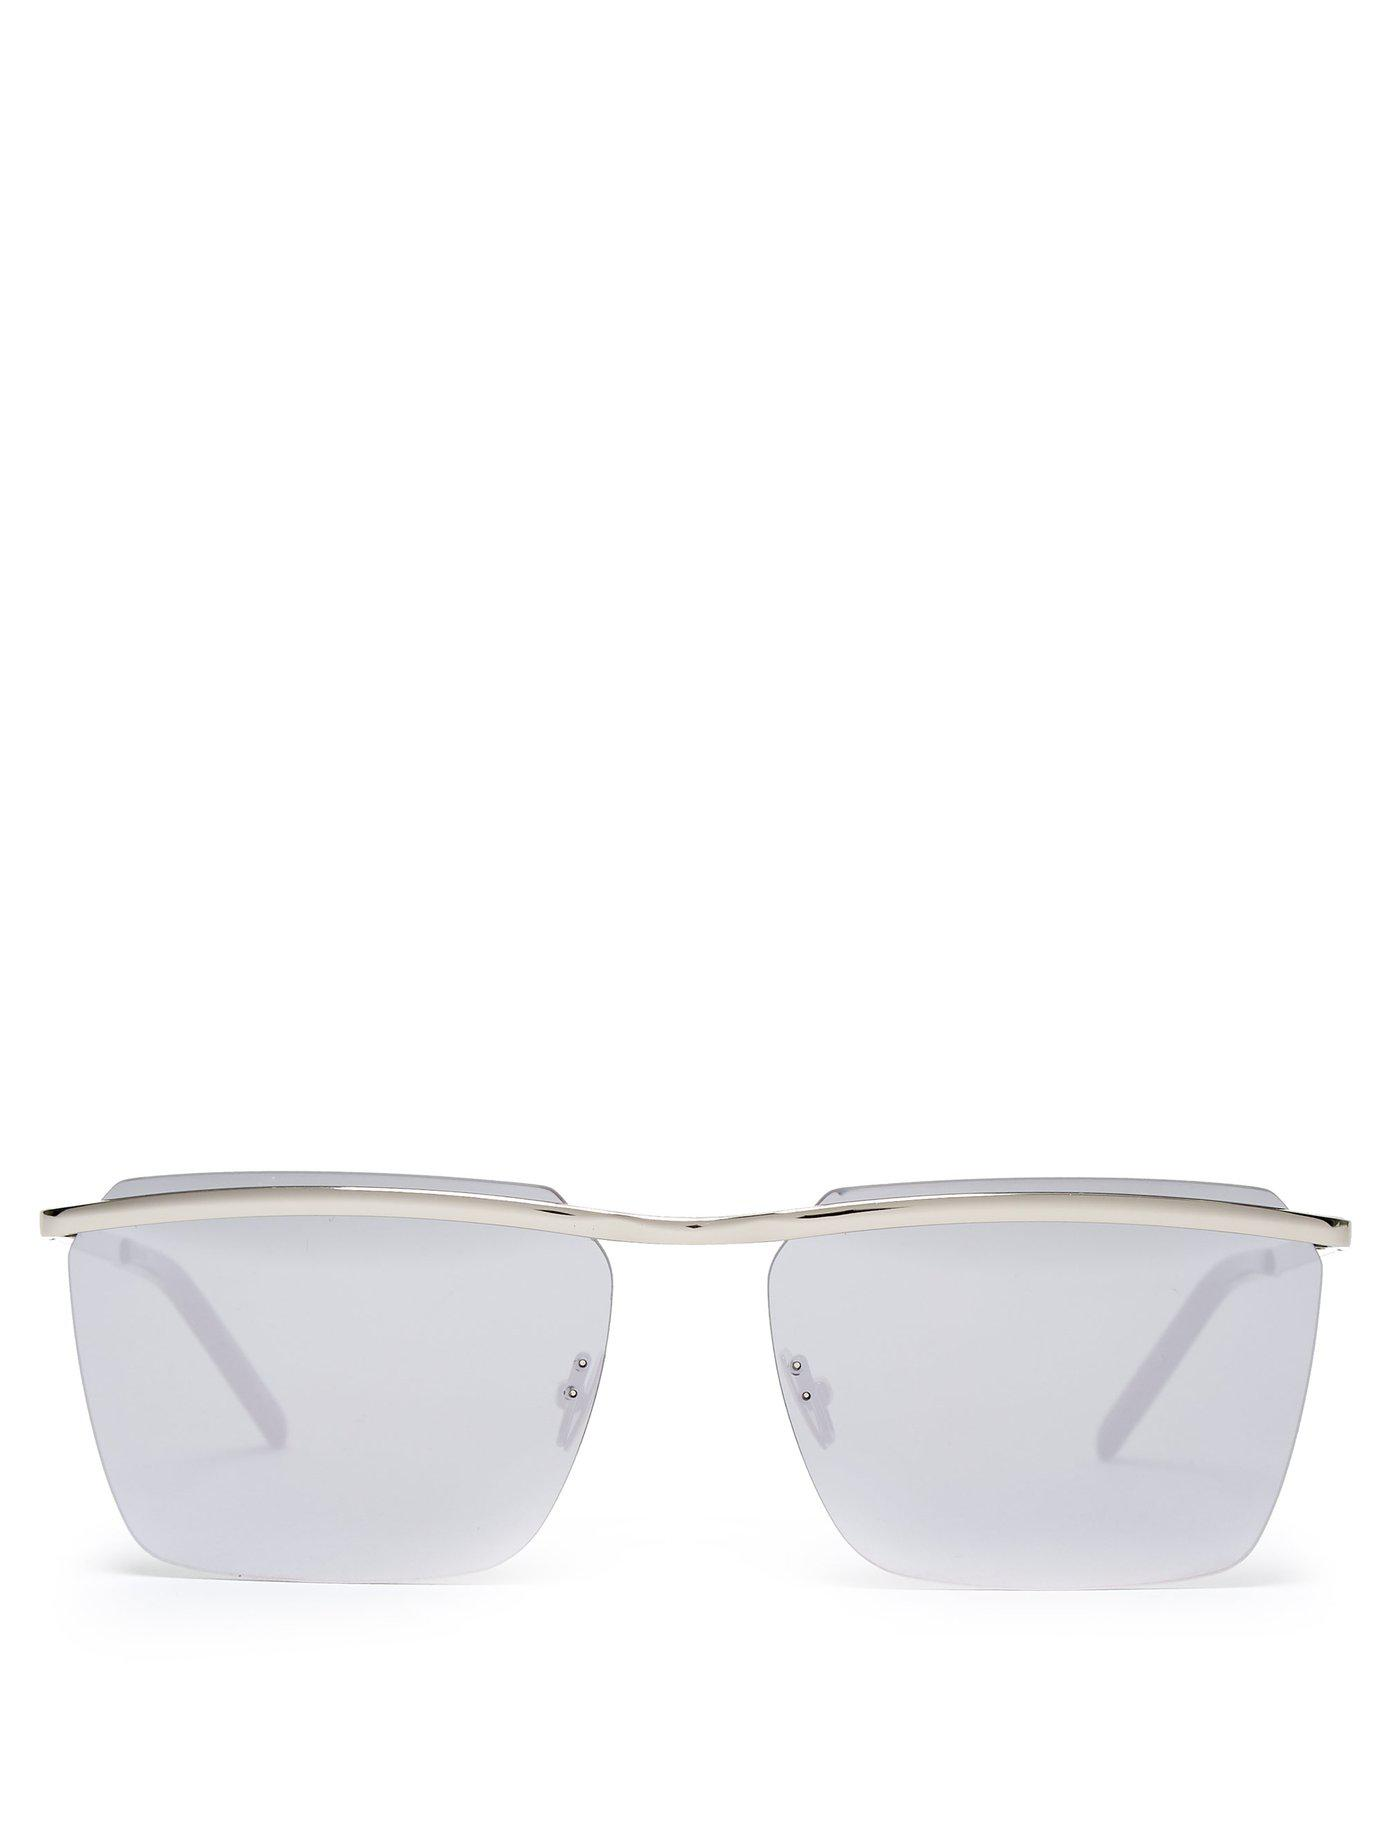 9c88d462d155 Lyst - Saint Laurent D Frame Metal Sunglasses in Metallic for Men